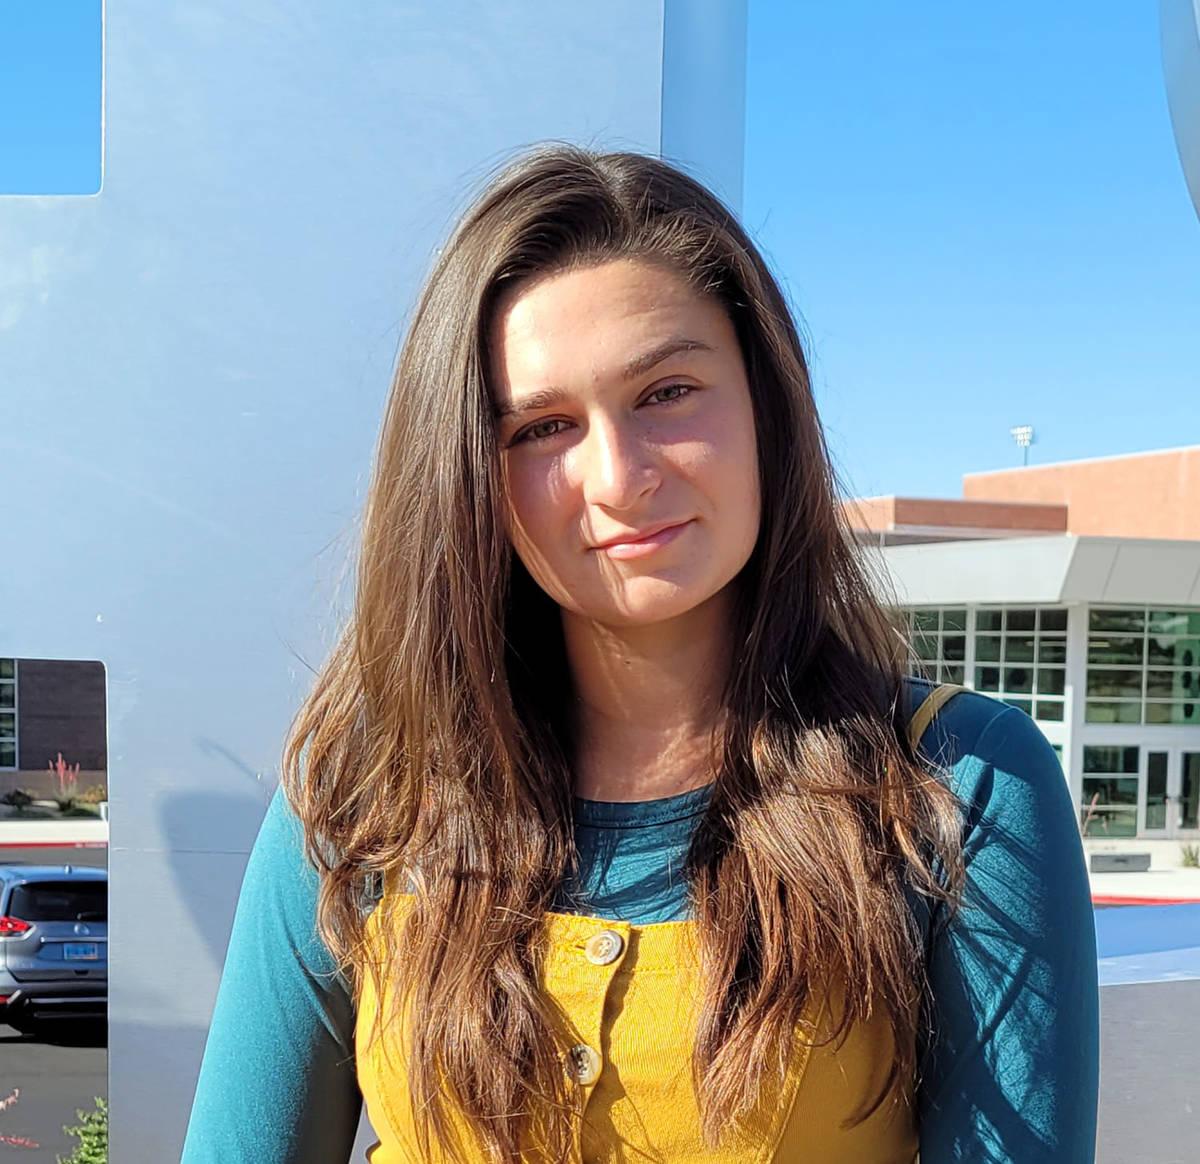 (Celia Shortt Goodyear/Boulder City Review) Sophie Dickerman, salutatorian